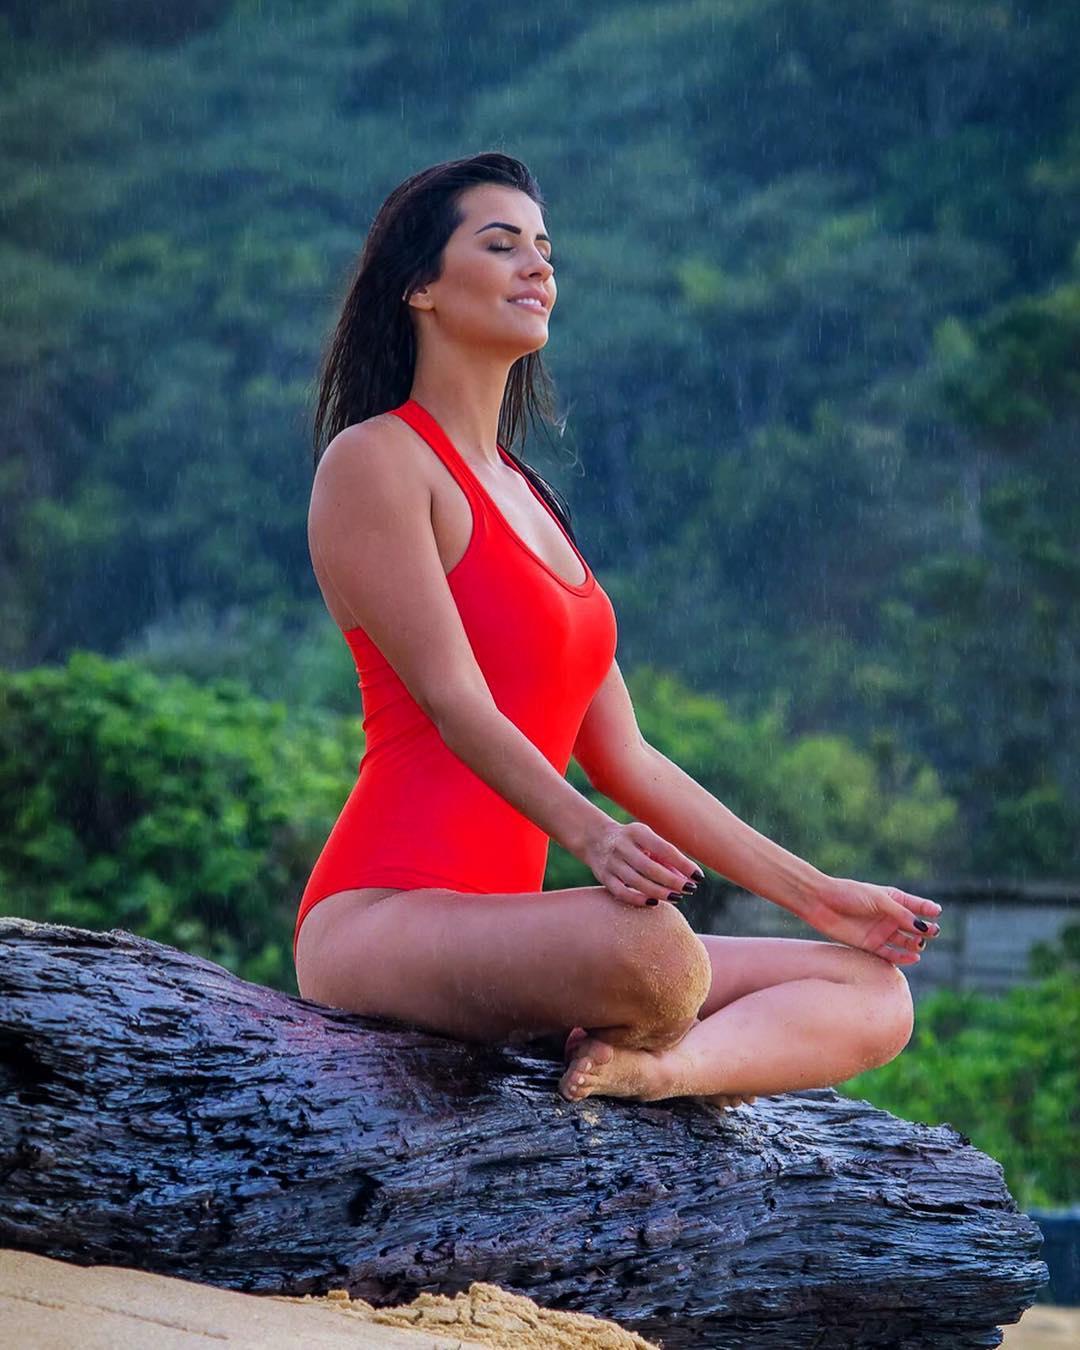 thylara brenner, miss brasil continentes unidos 2019. 27878614